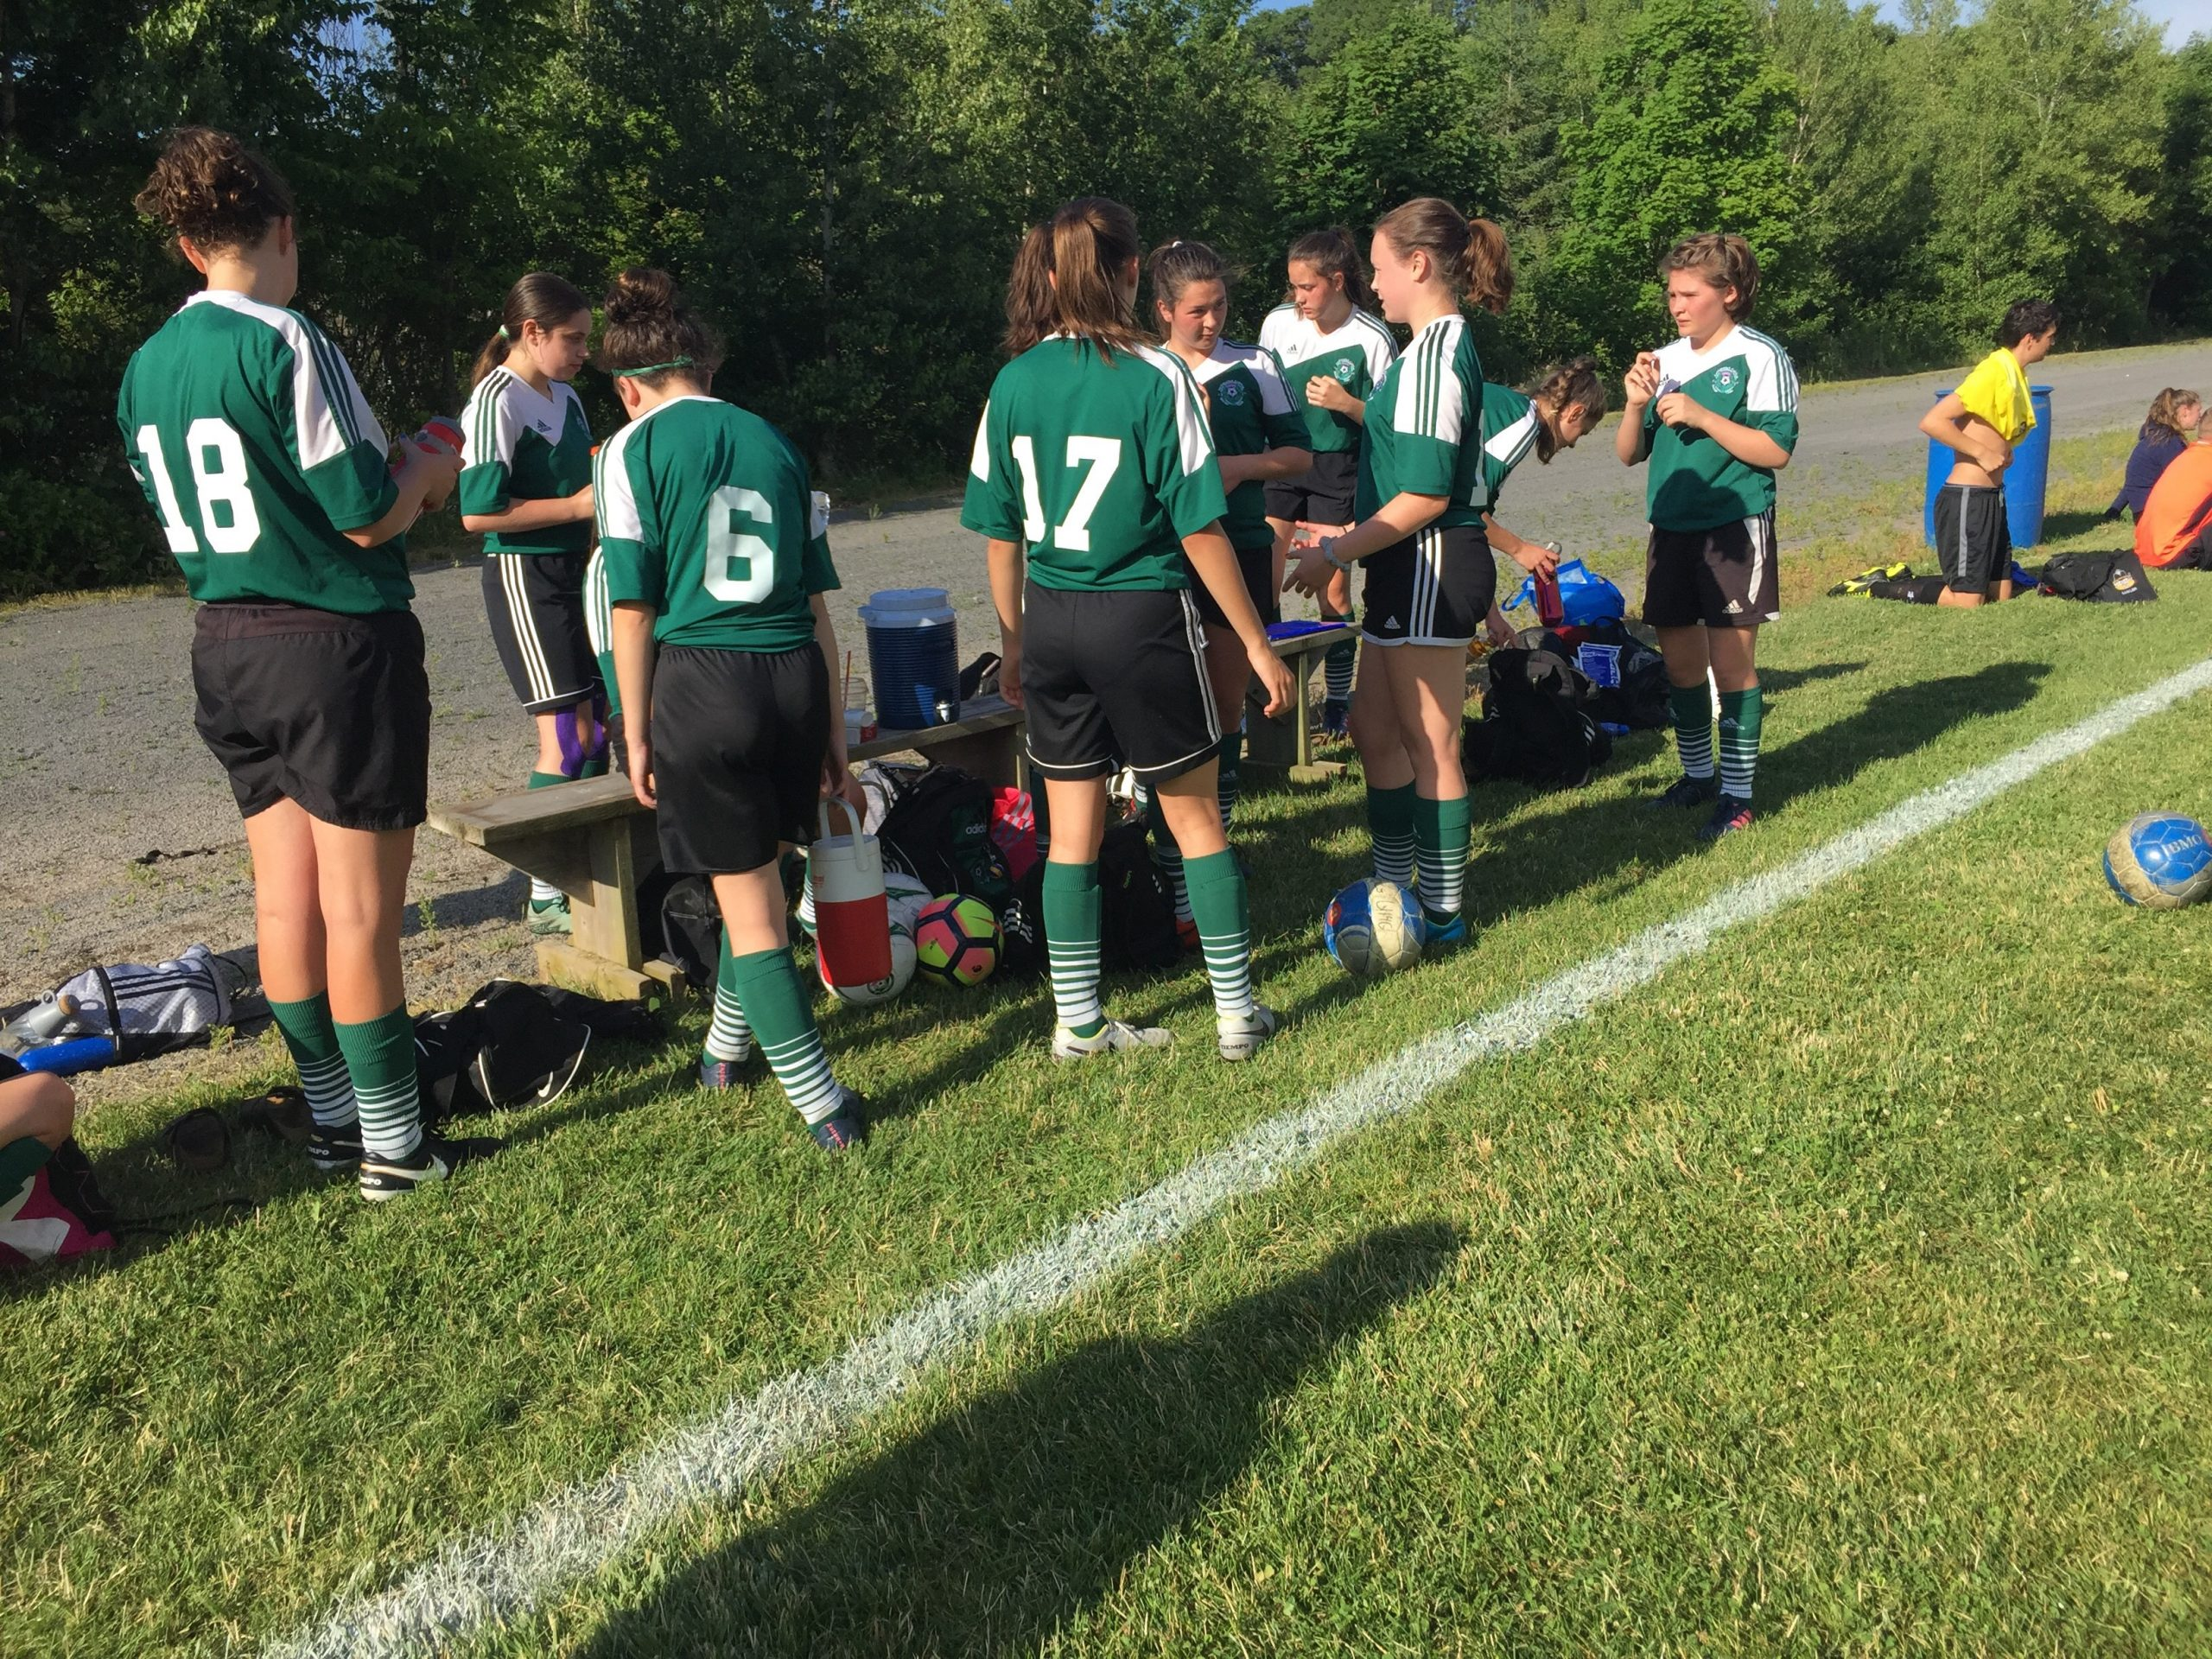 Gunn Tournament U15 Girls Soccer (from Wolfville Saturday)